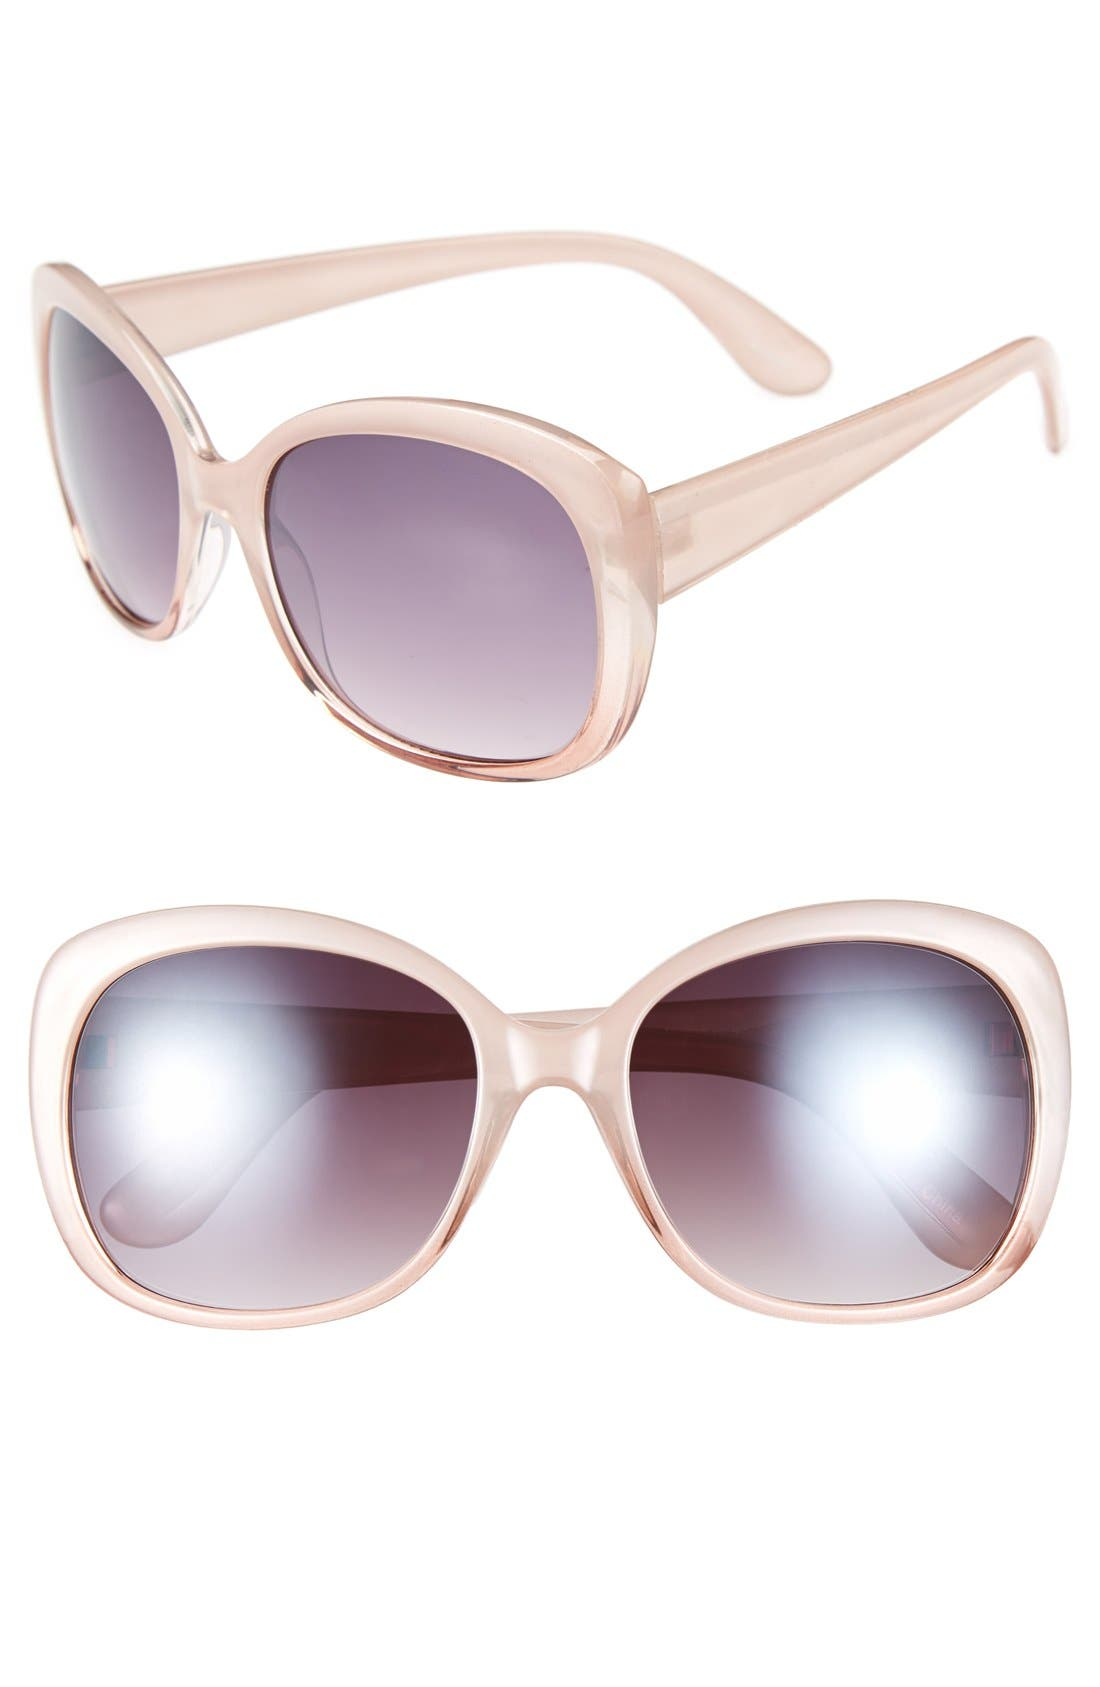 Main Image - Icon Eyewear 'Tokyo' 56mm Oversized Sunglasses (2 for $20)